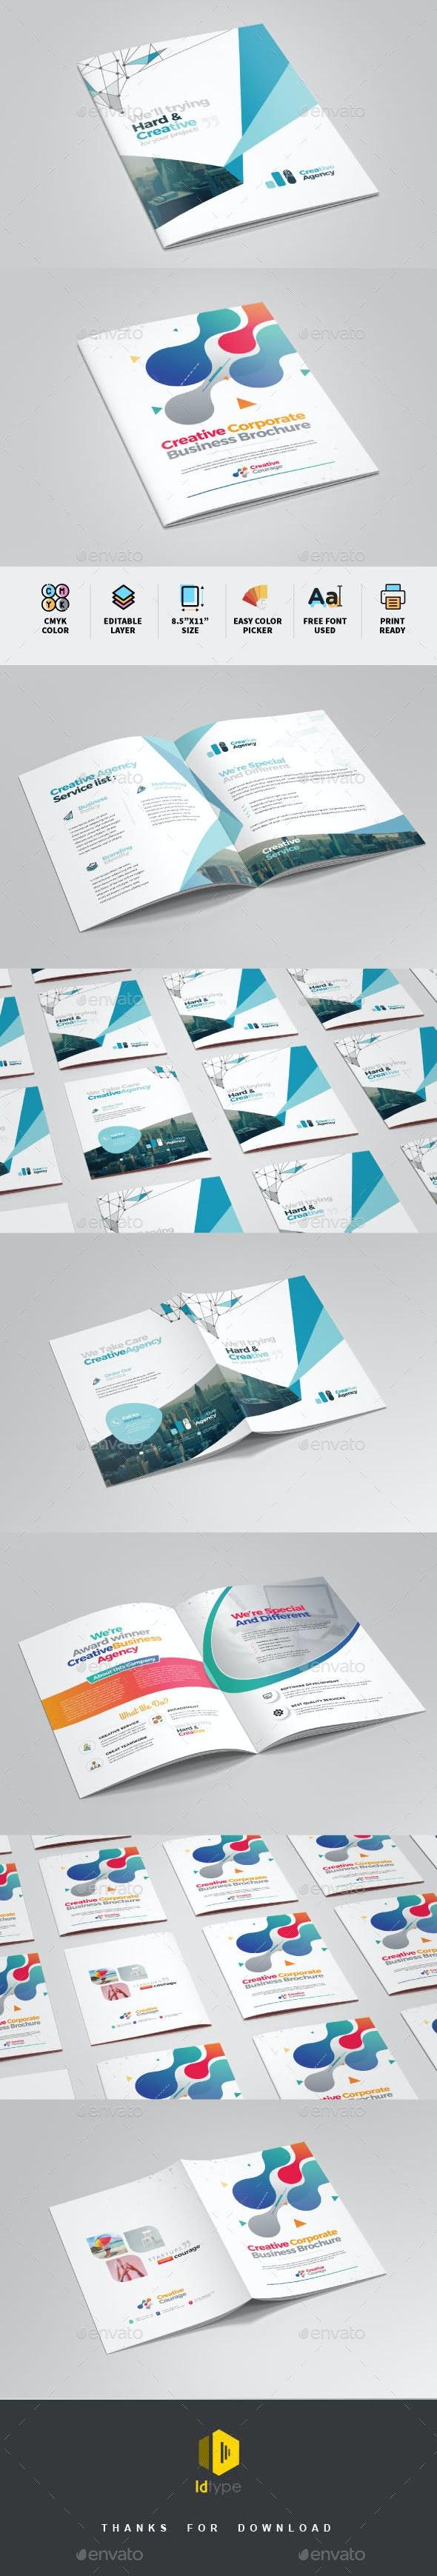 Bifold Brochure Bundle - Brochures Print Templates